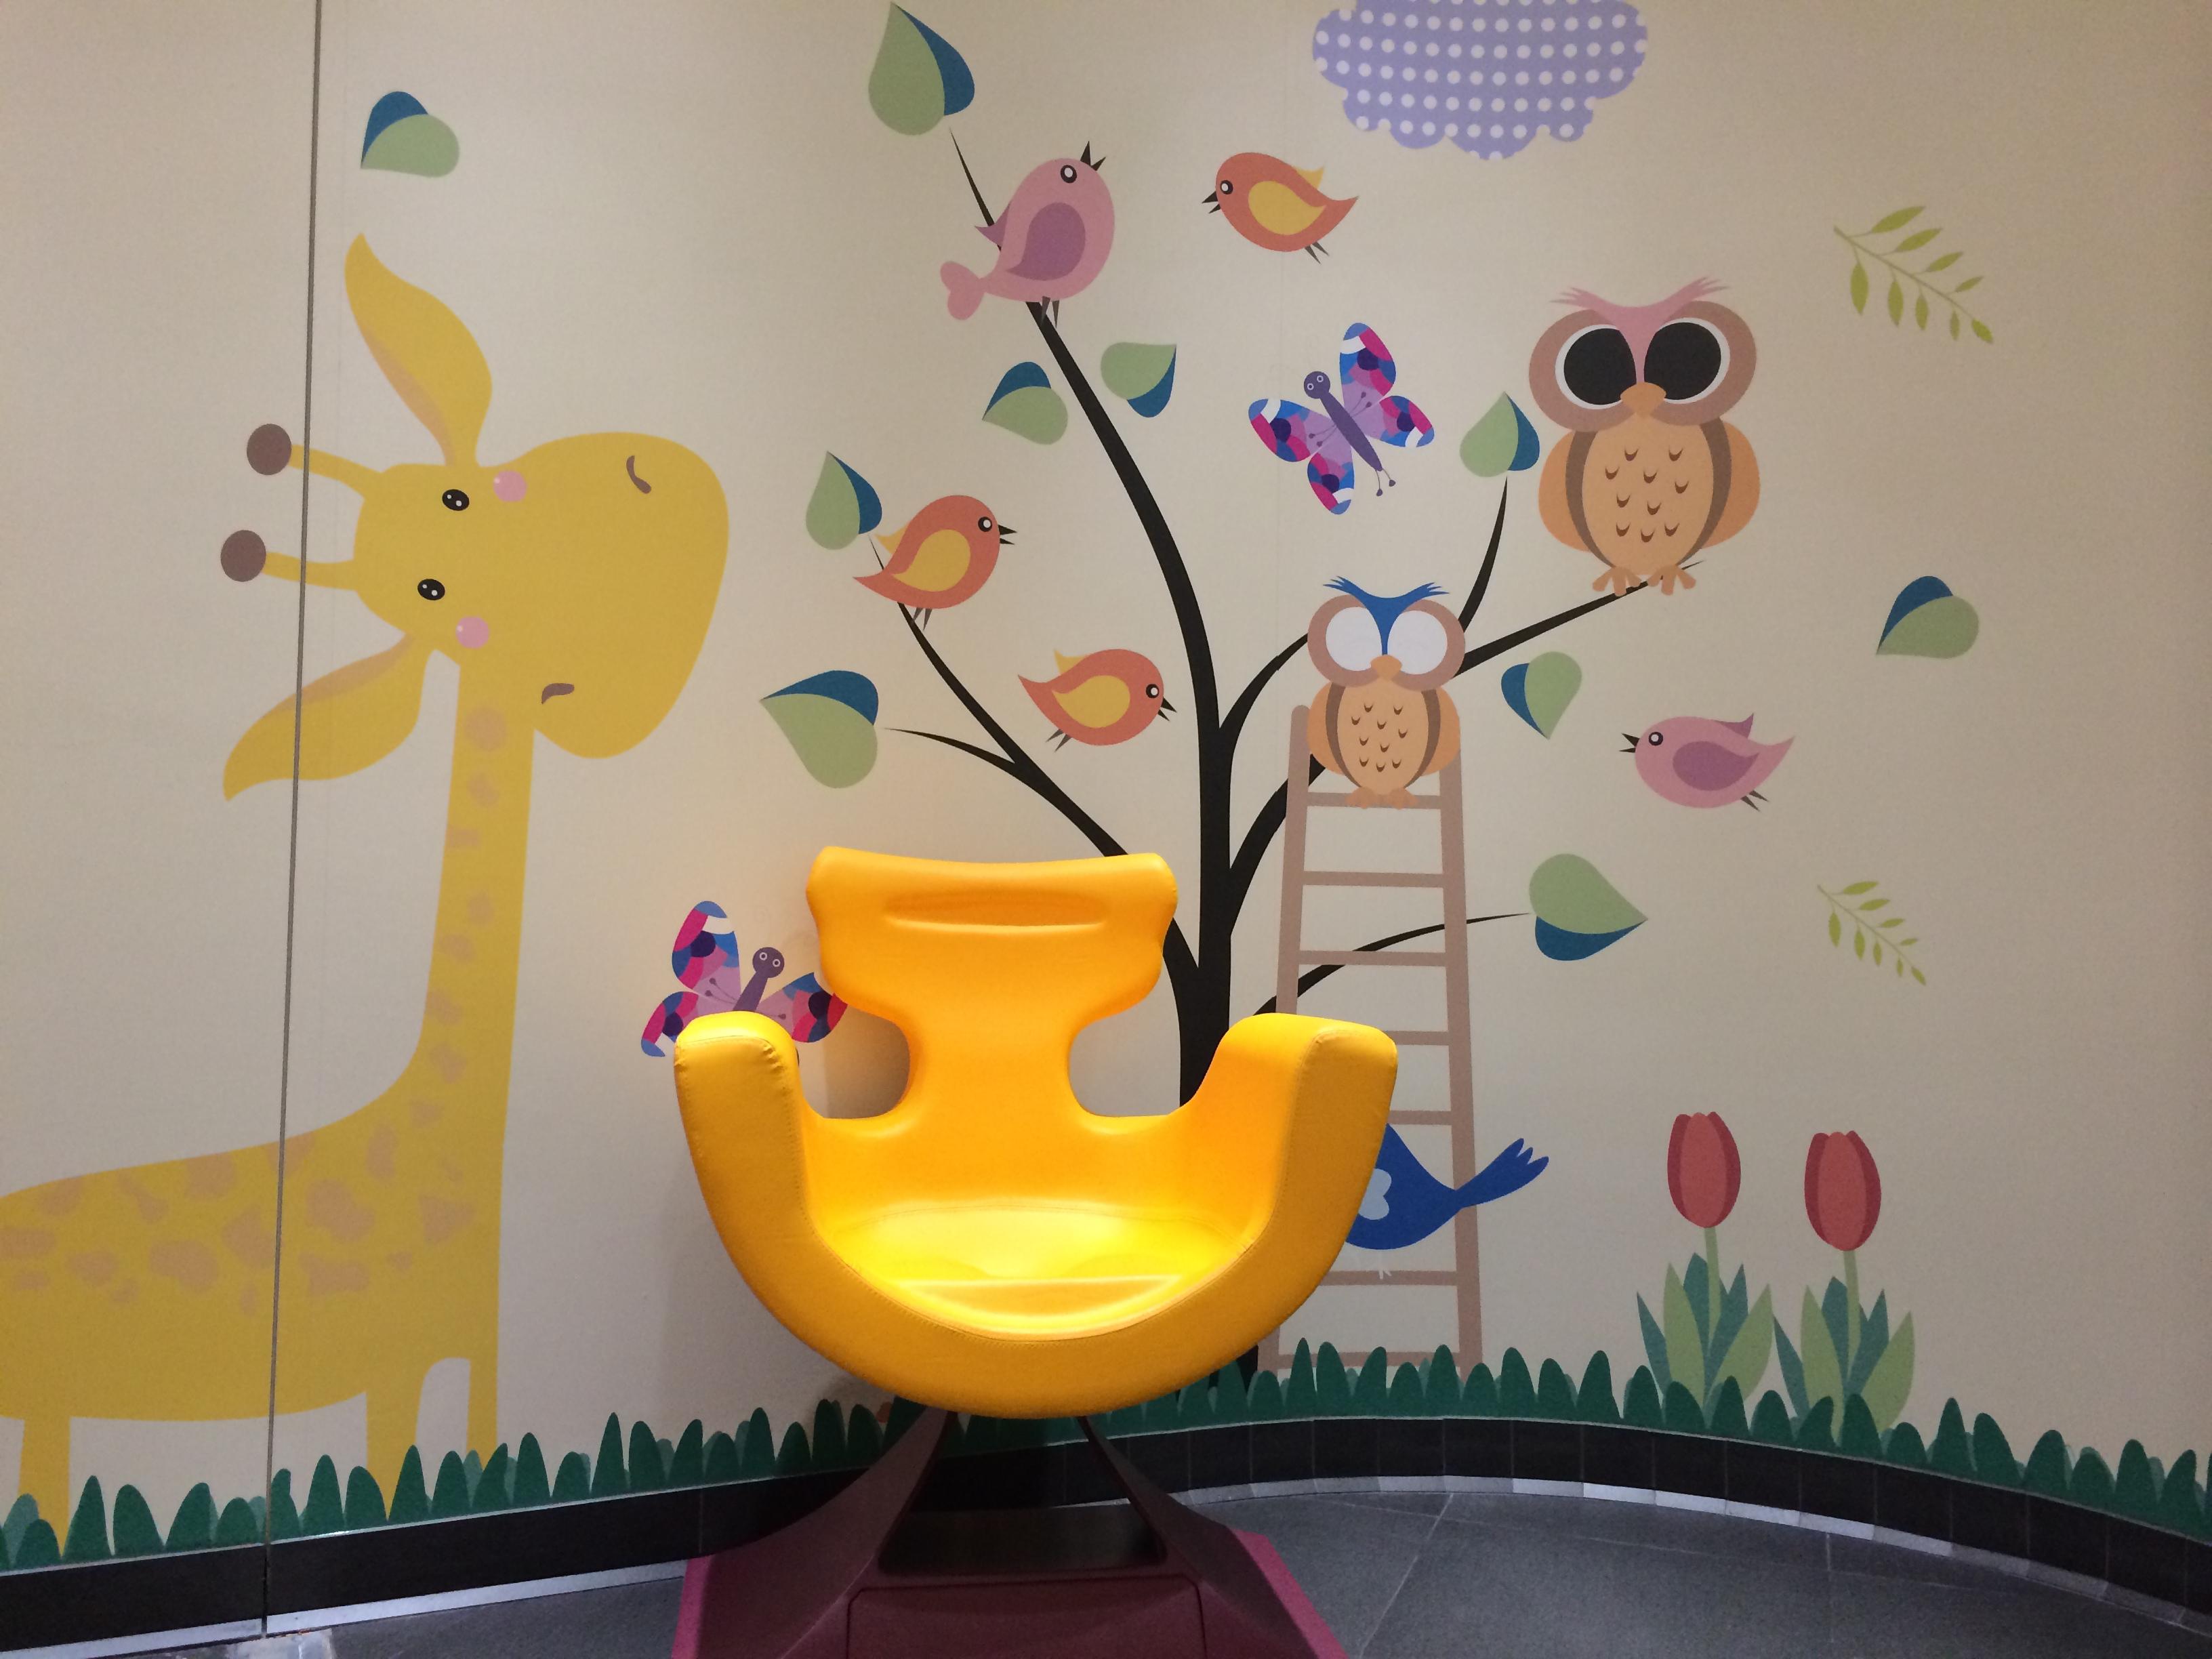 Family Room Centro Commerciale Nave de Vero